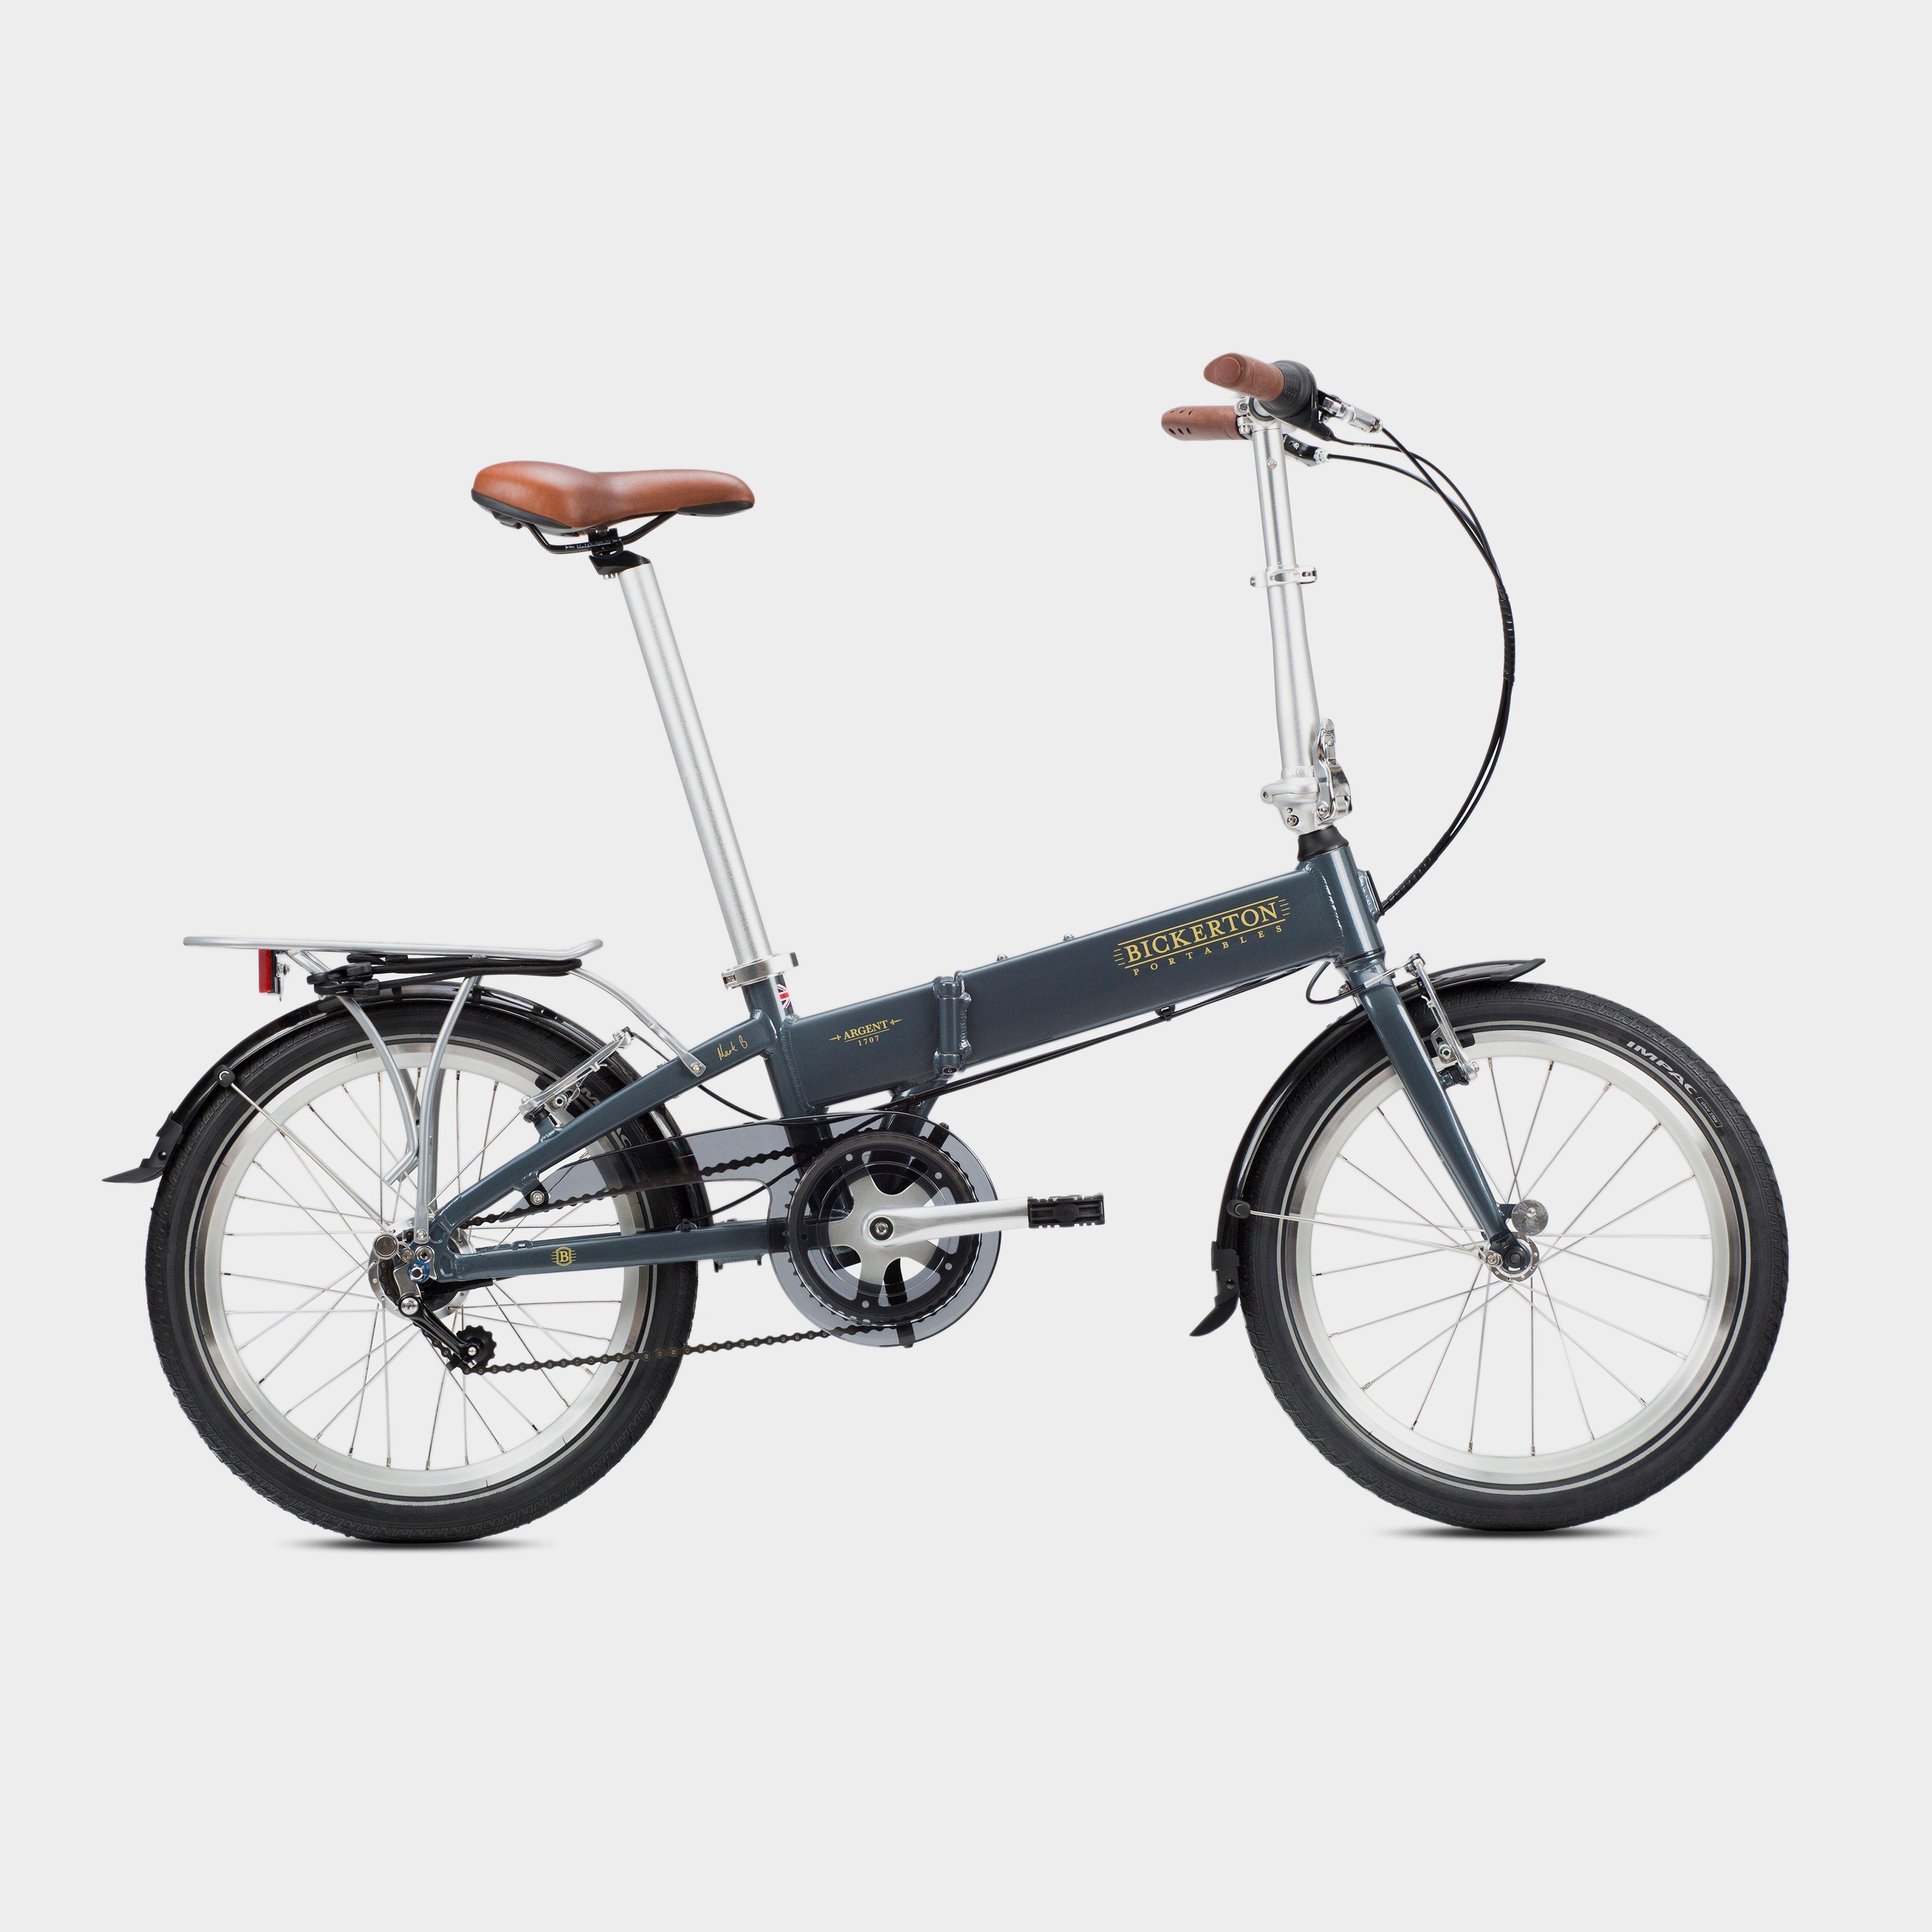 Bickerton Bickerton Argent 1707 City Folding Bike - Grey/grey  Grey/grey